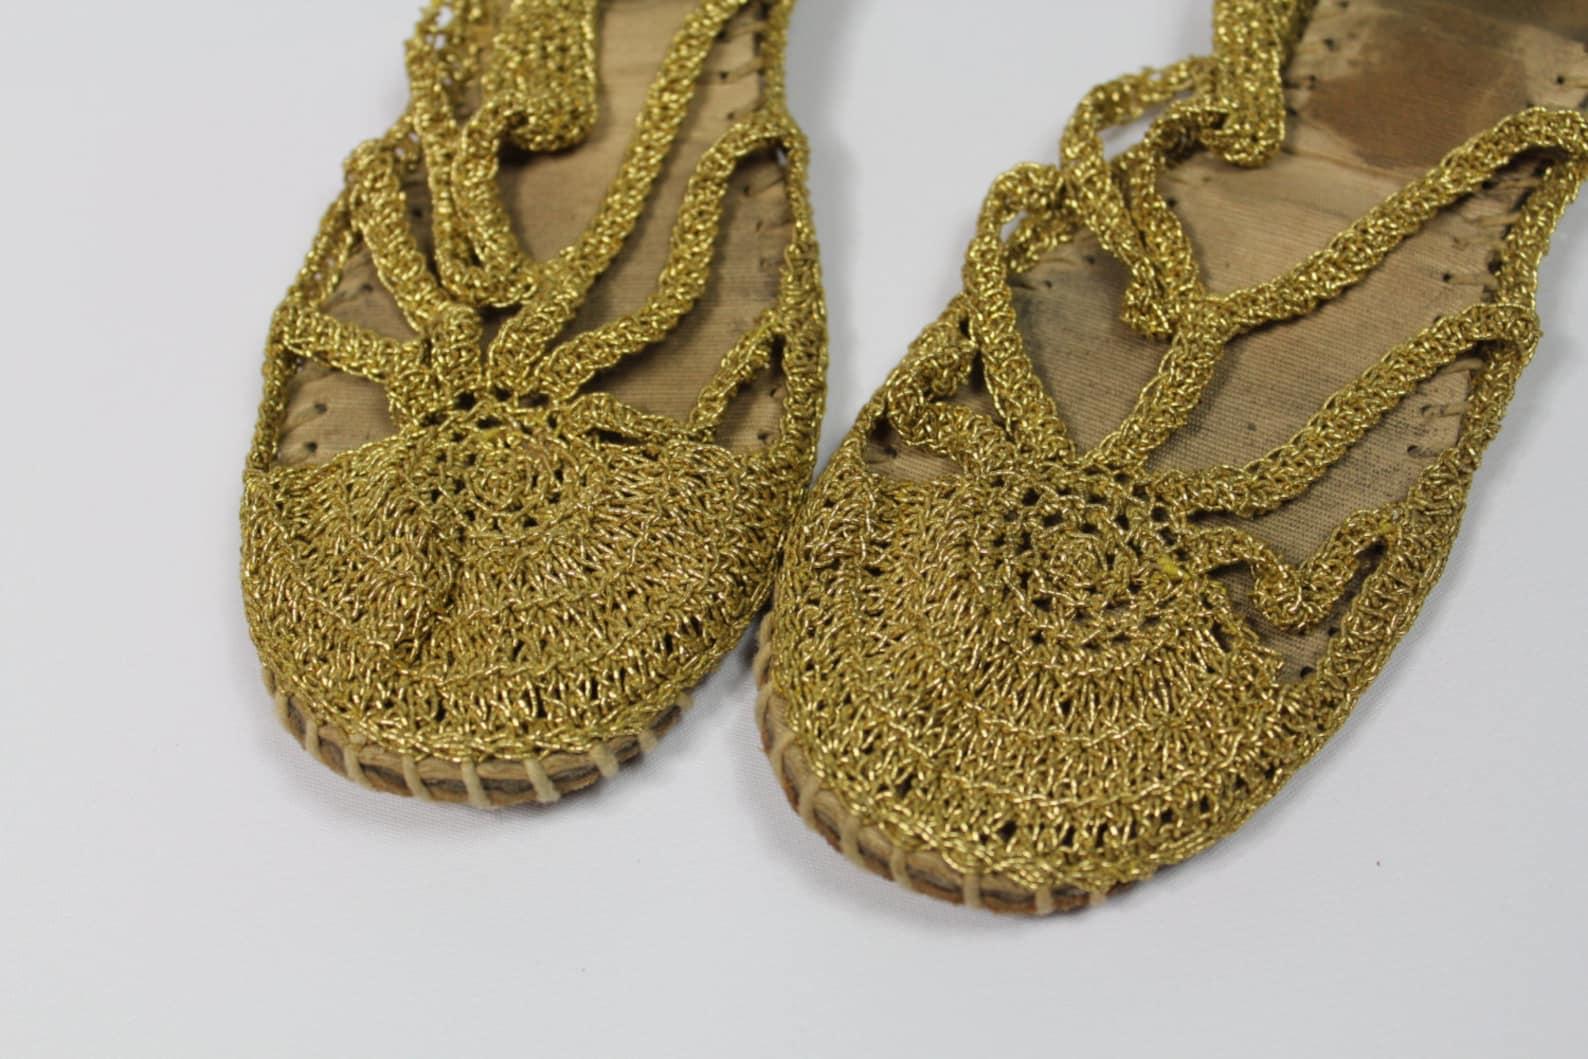 gladiator gold ballet ballerina flats woven crochet slippers dance metallic strappy sandals women's grecian goddess shoes we